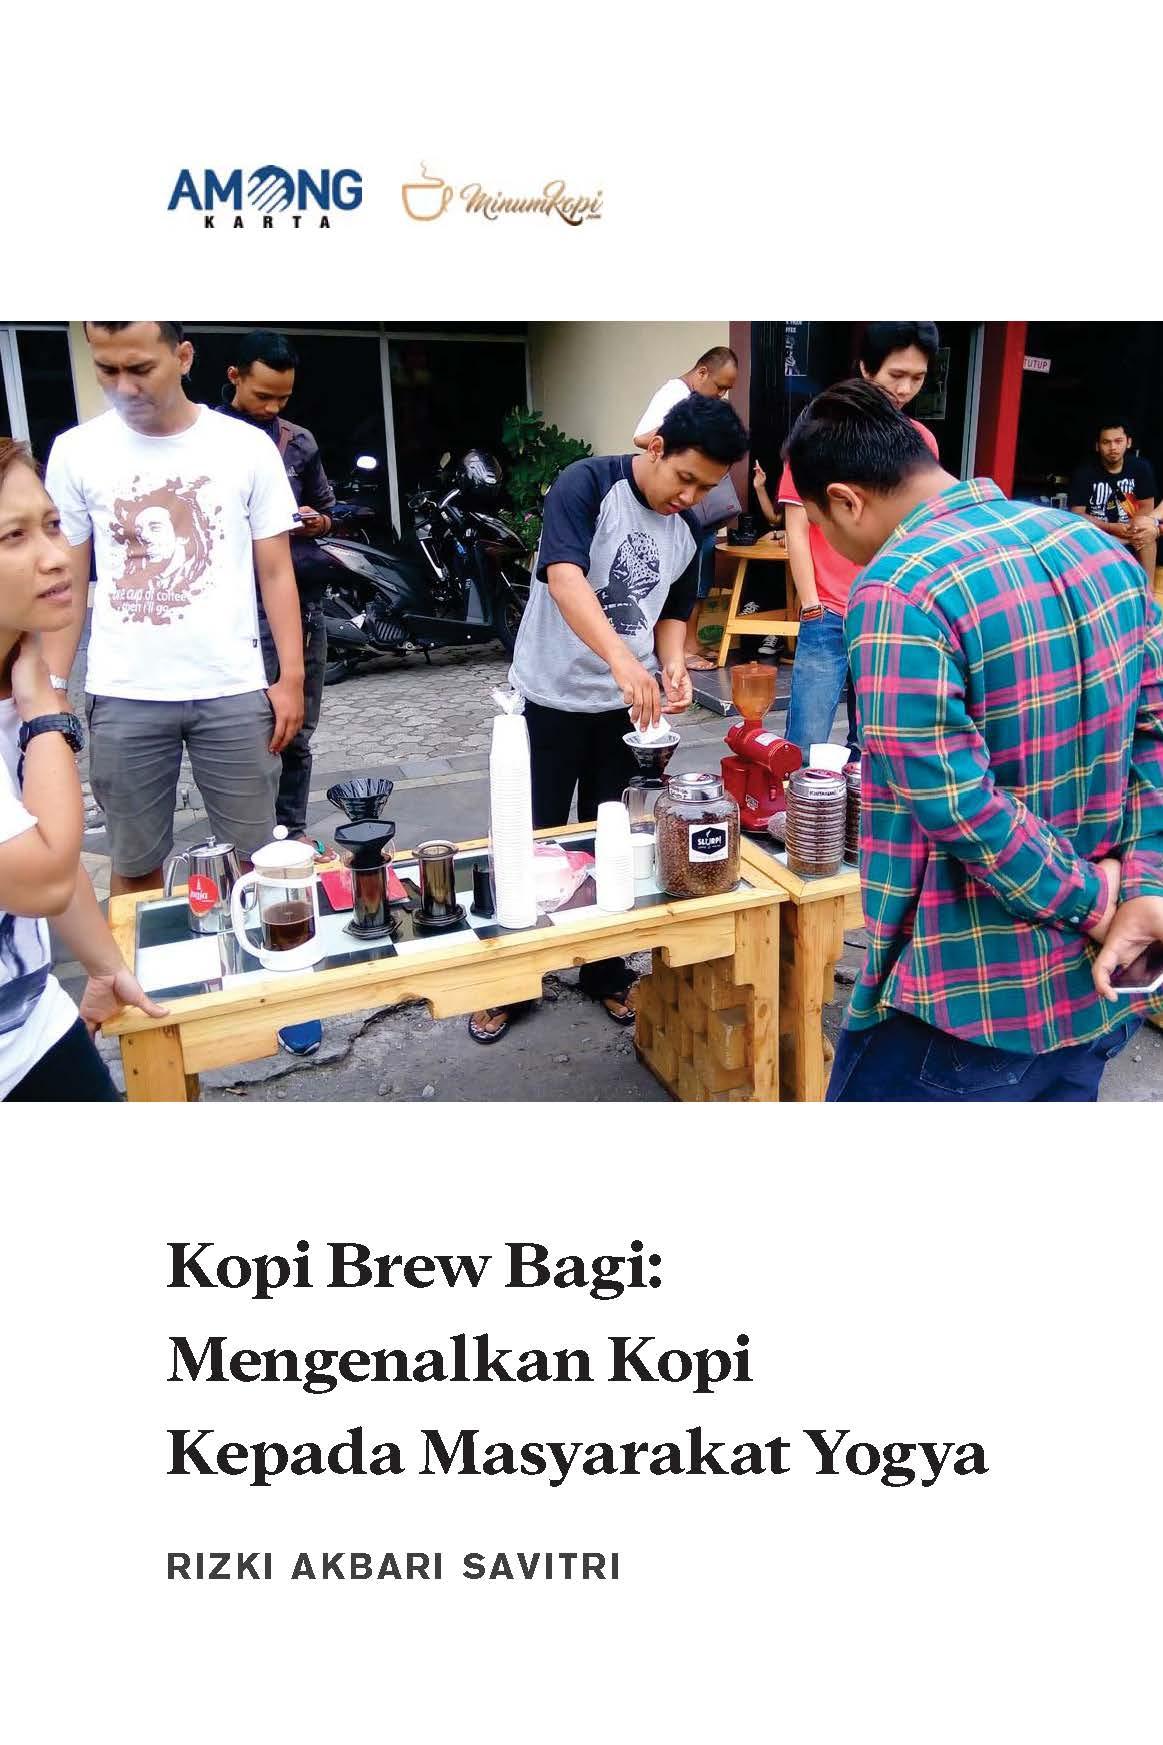 Kopi brew bagi [sumber elektronis] : mengenalkan kopi kepada masyarakat Yogya